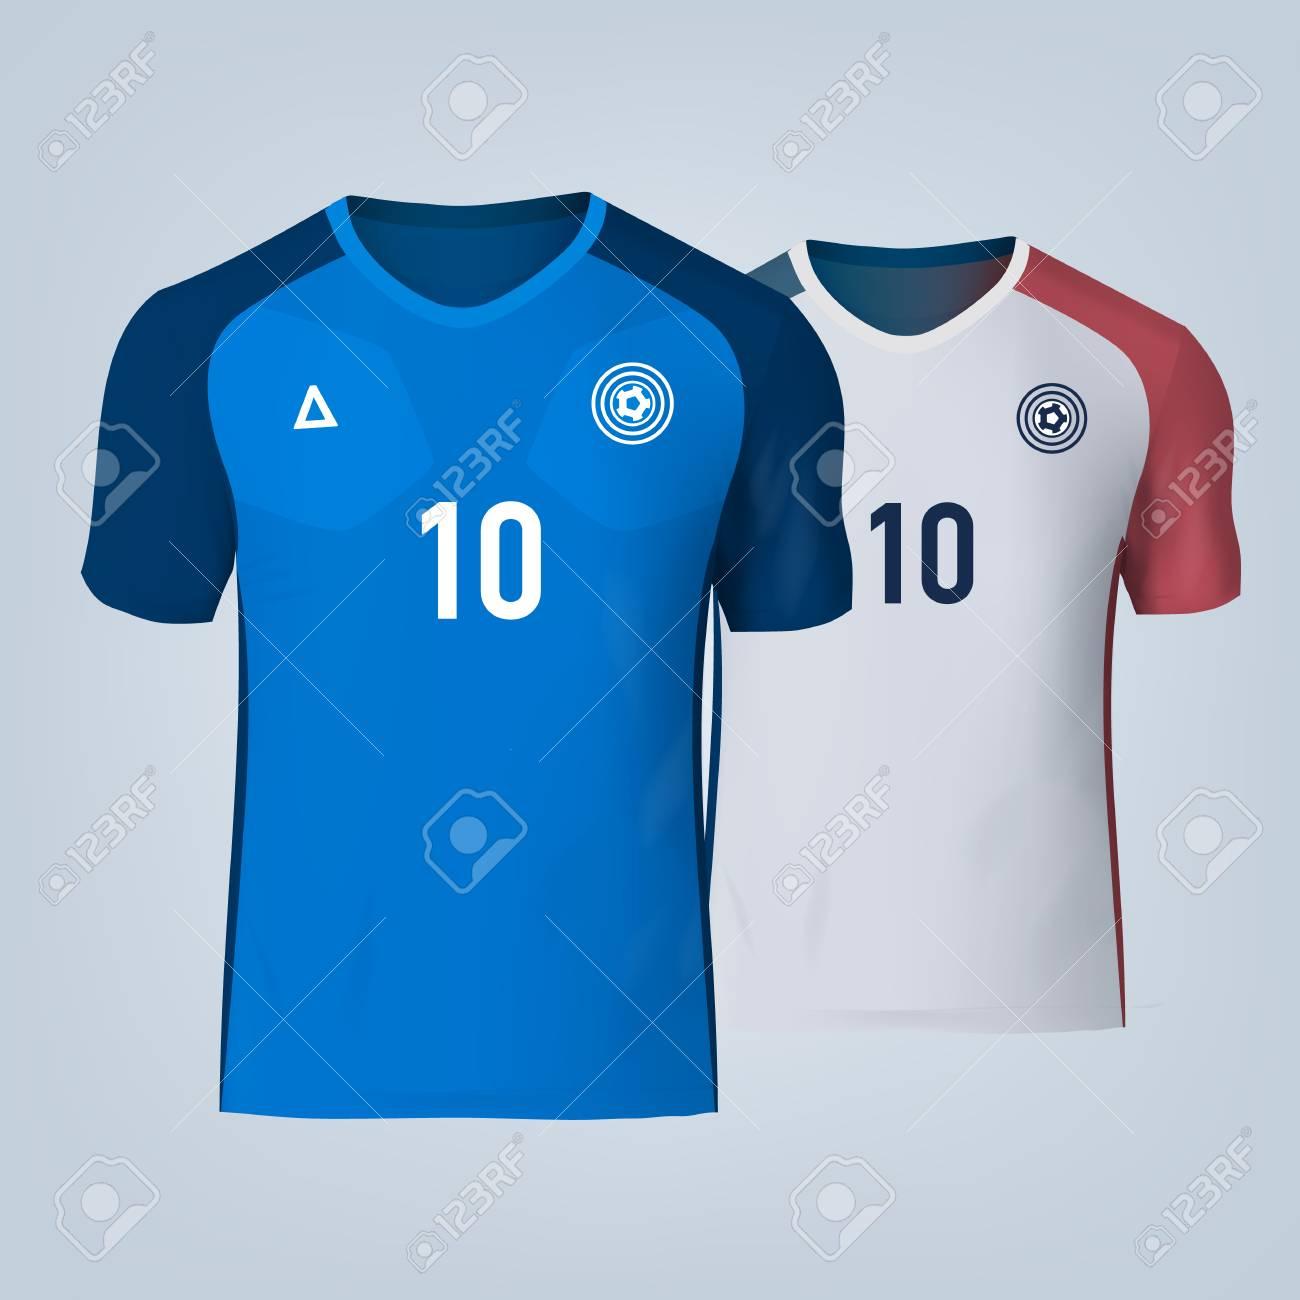 Vector illustration of football t-shirt template. - 84012293